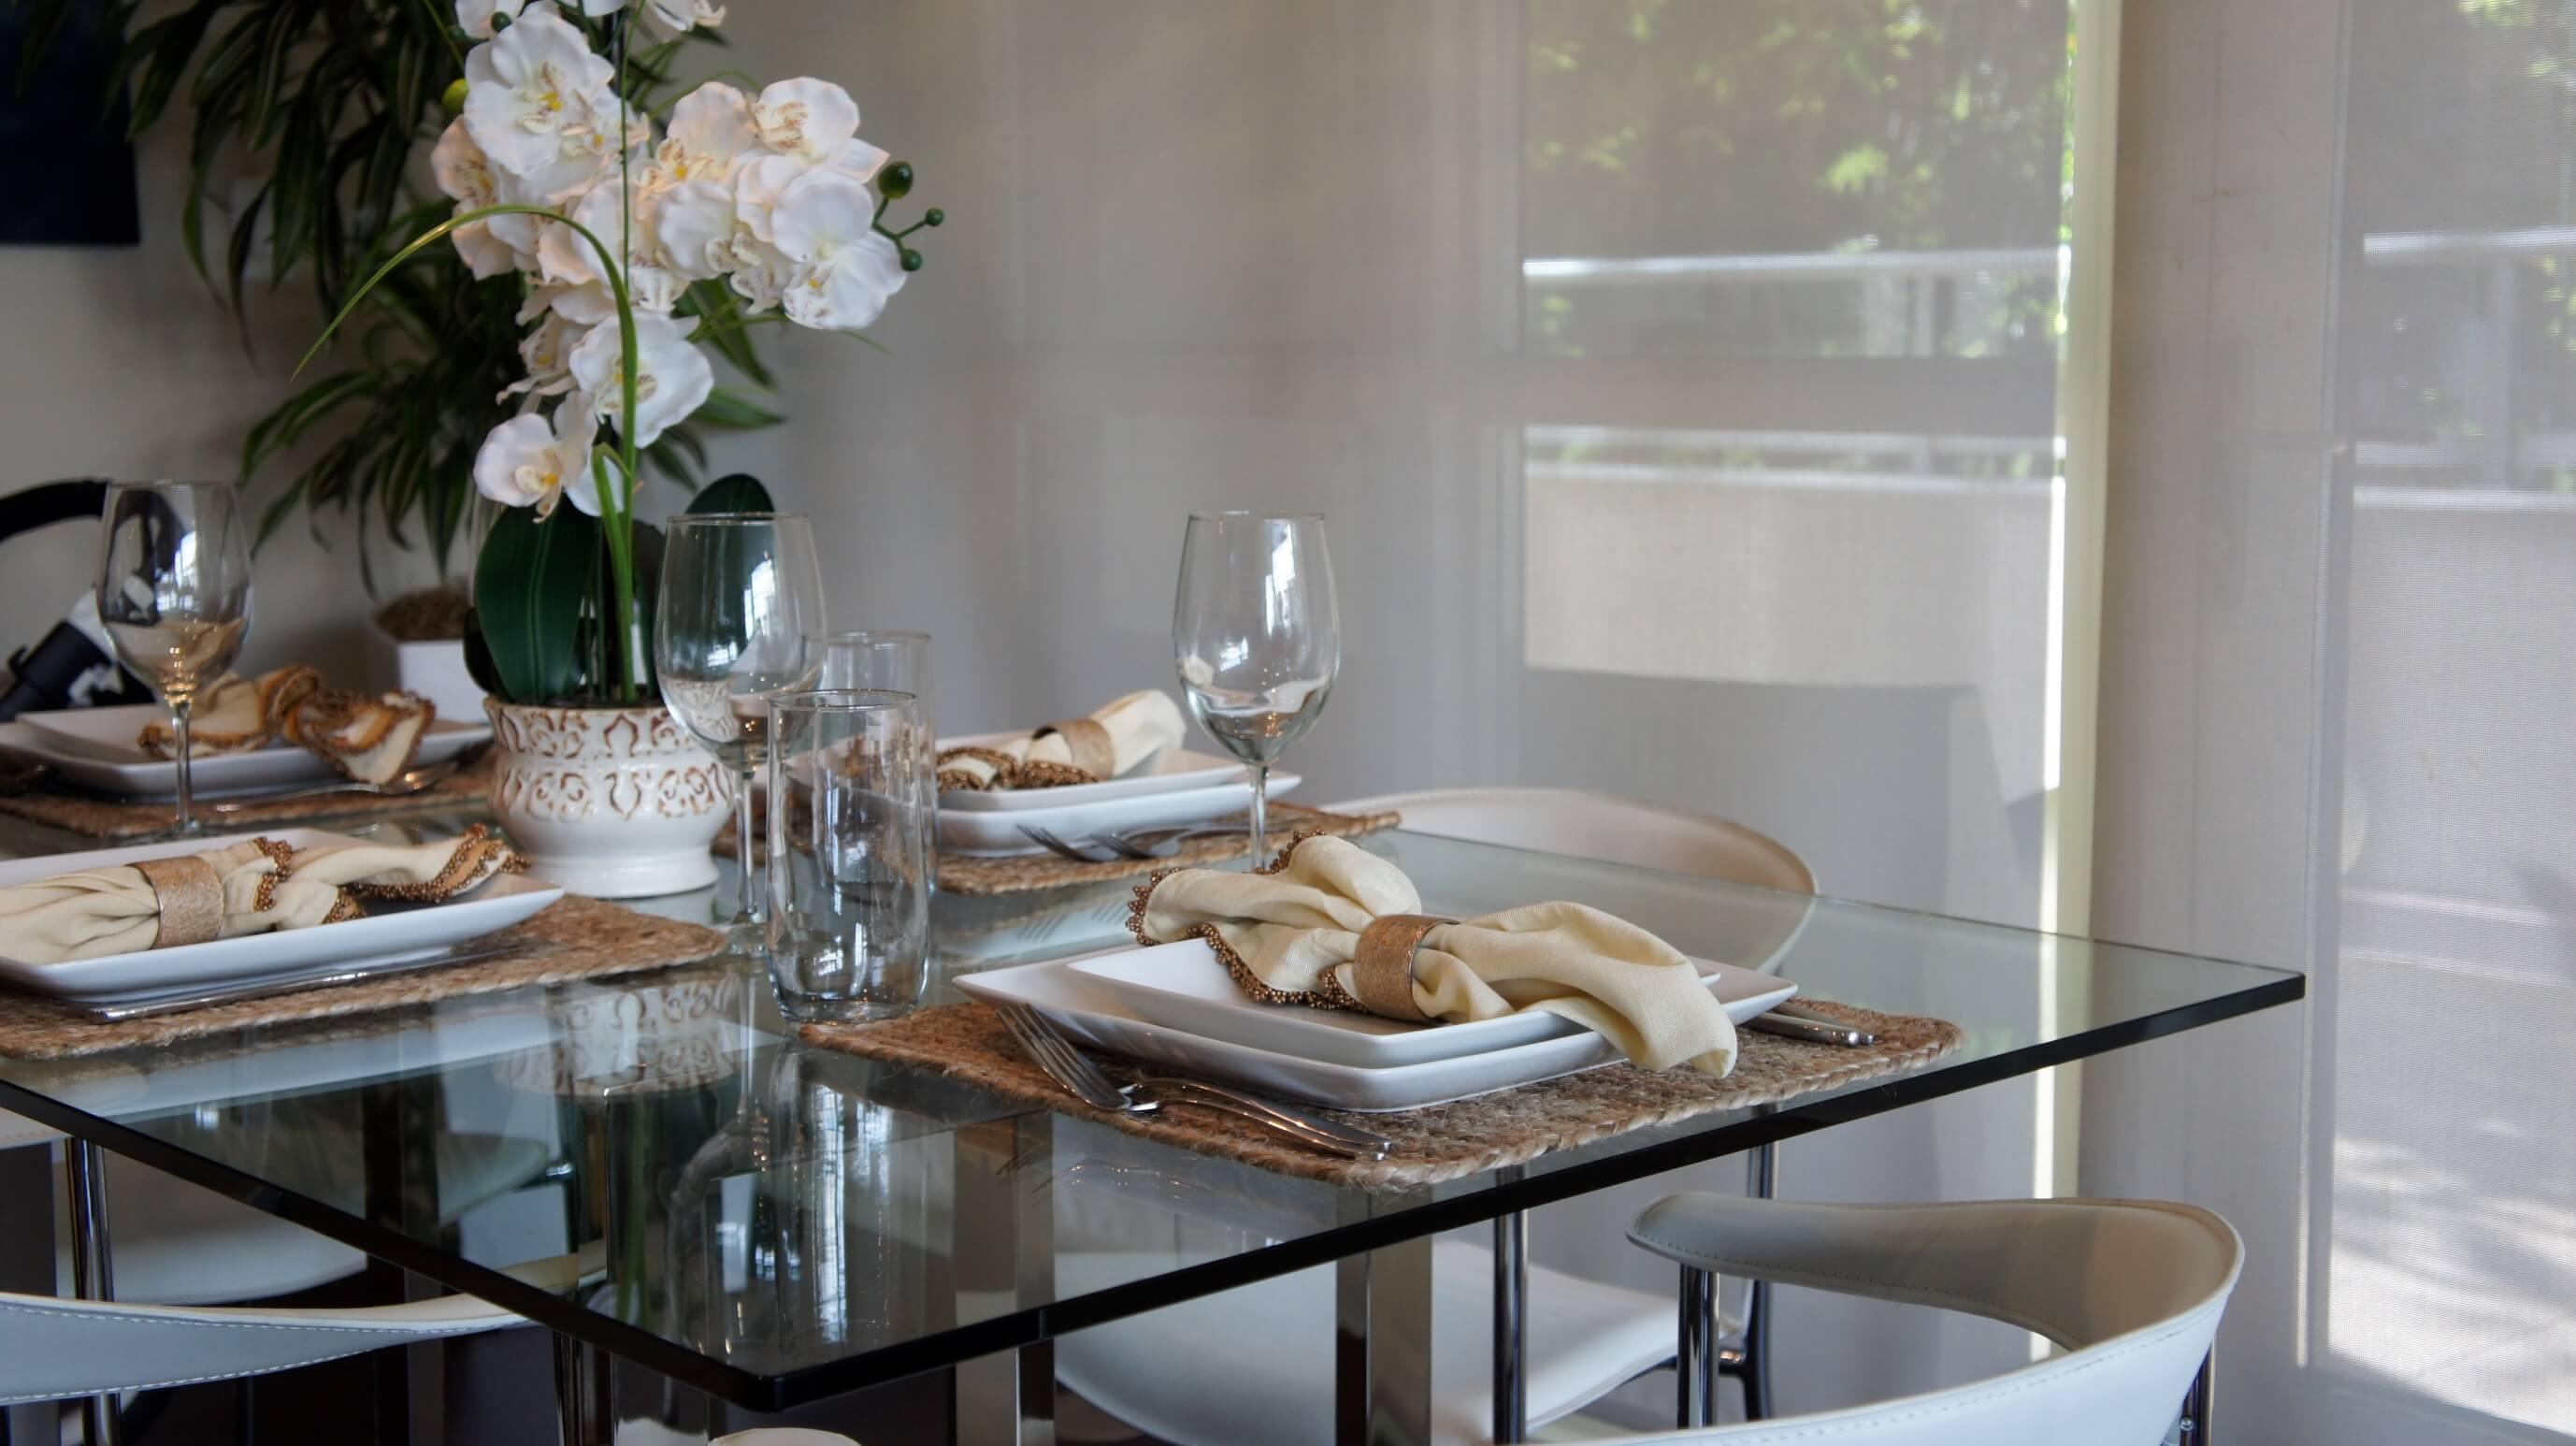 astoria-at-central-park-west-x-nubry-luxury-apartments-irvine-california-11